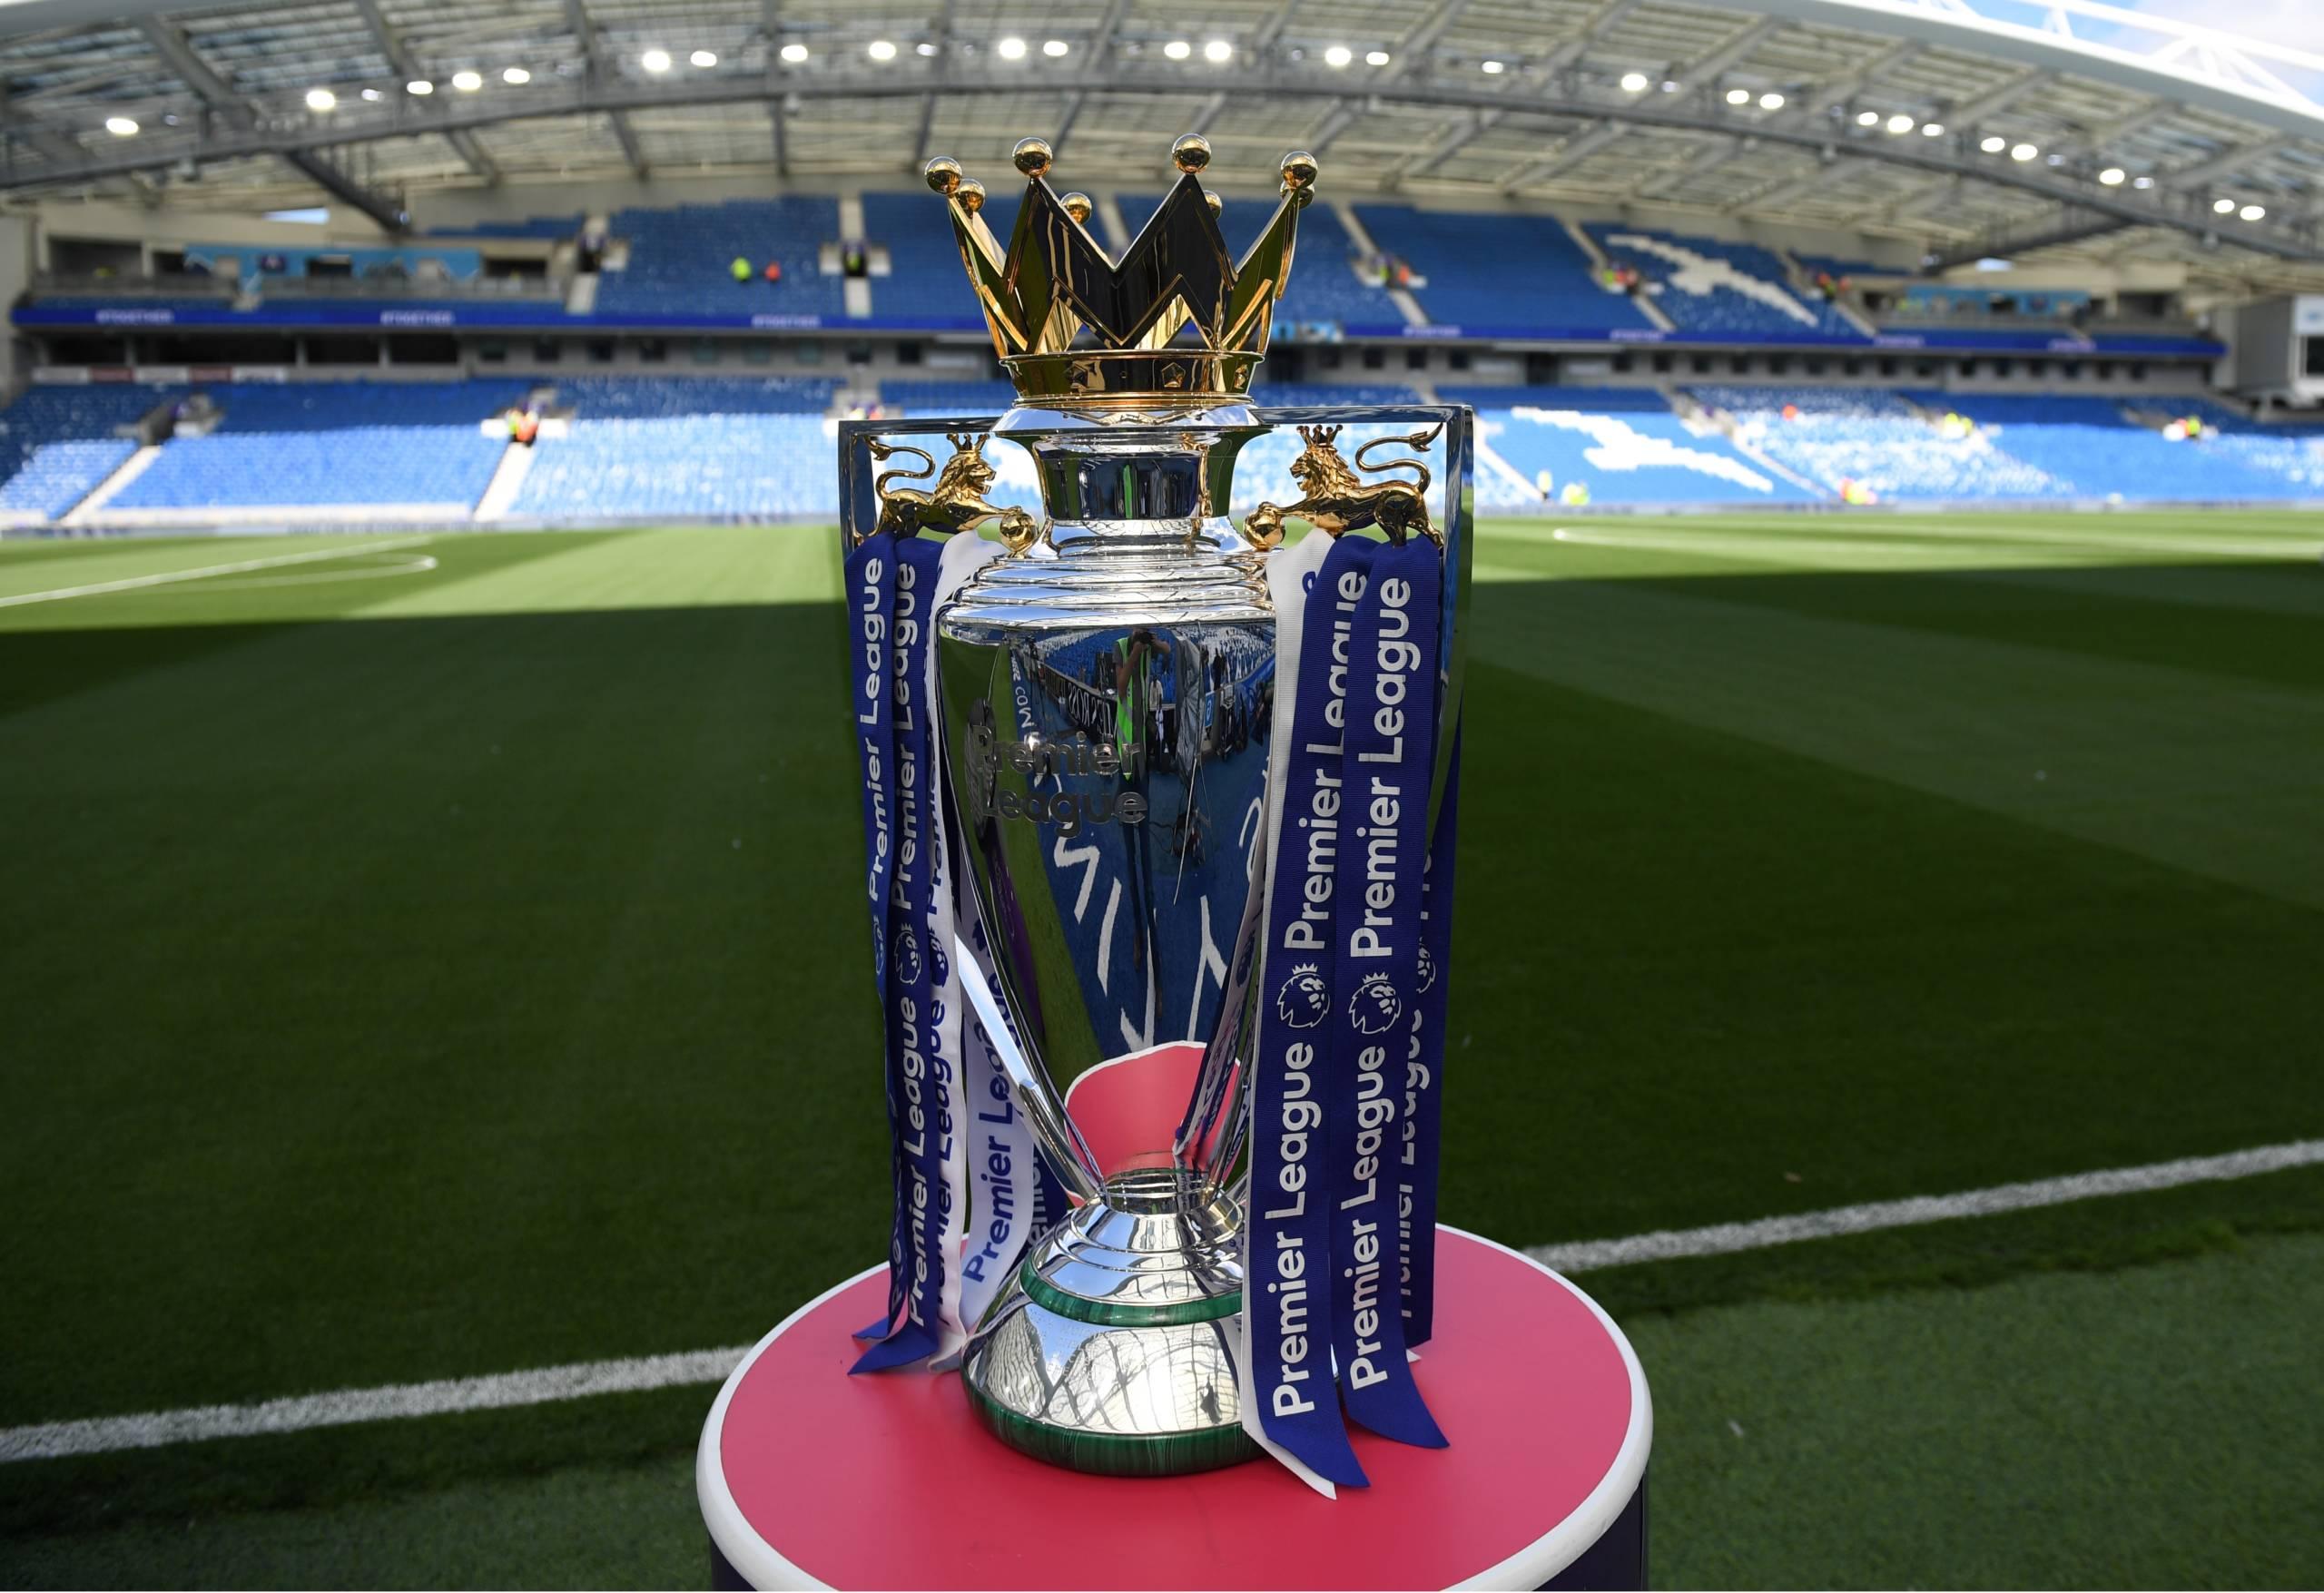 Ninguém testa positivo na última rodada de exames de covid-19 na Premier League